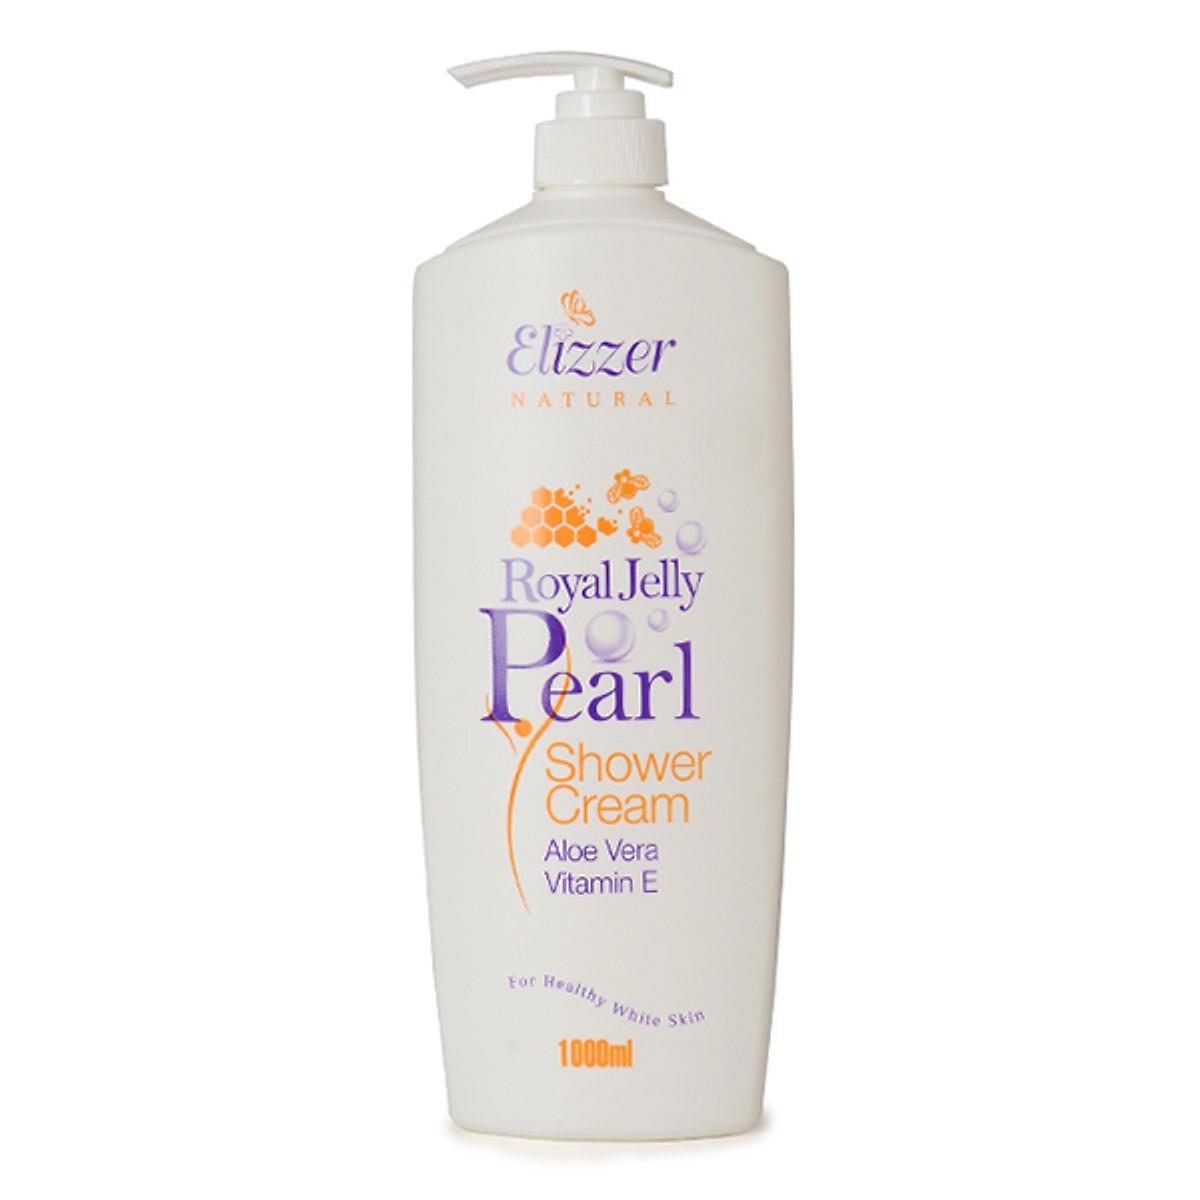 Sữa tắm Elizzer Royal Jelly Pearl 500ml